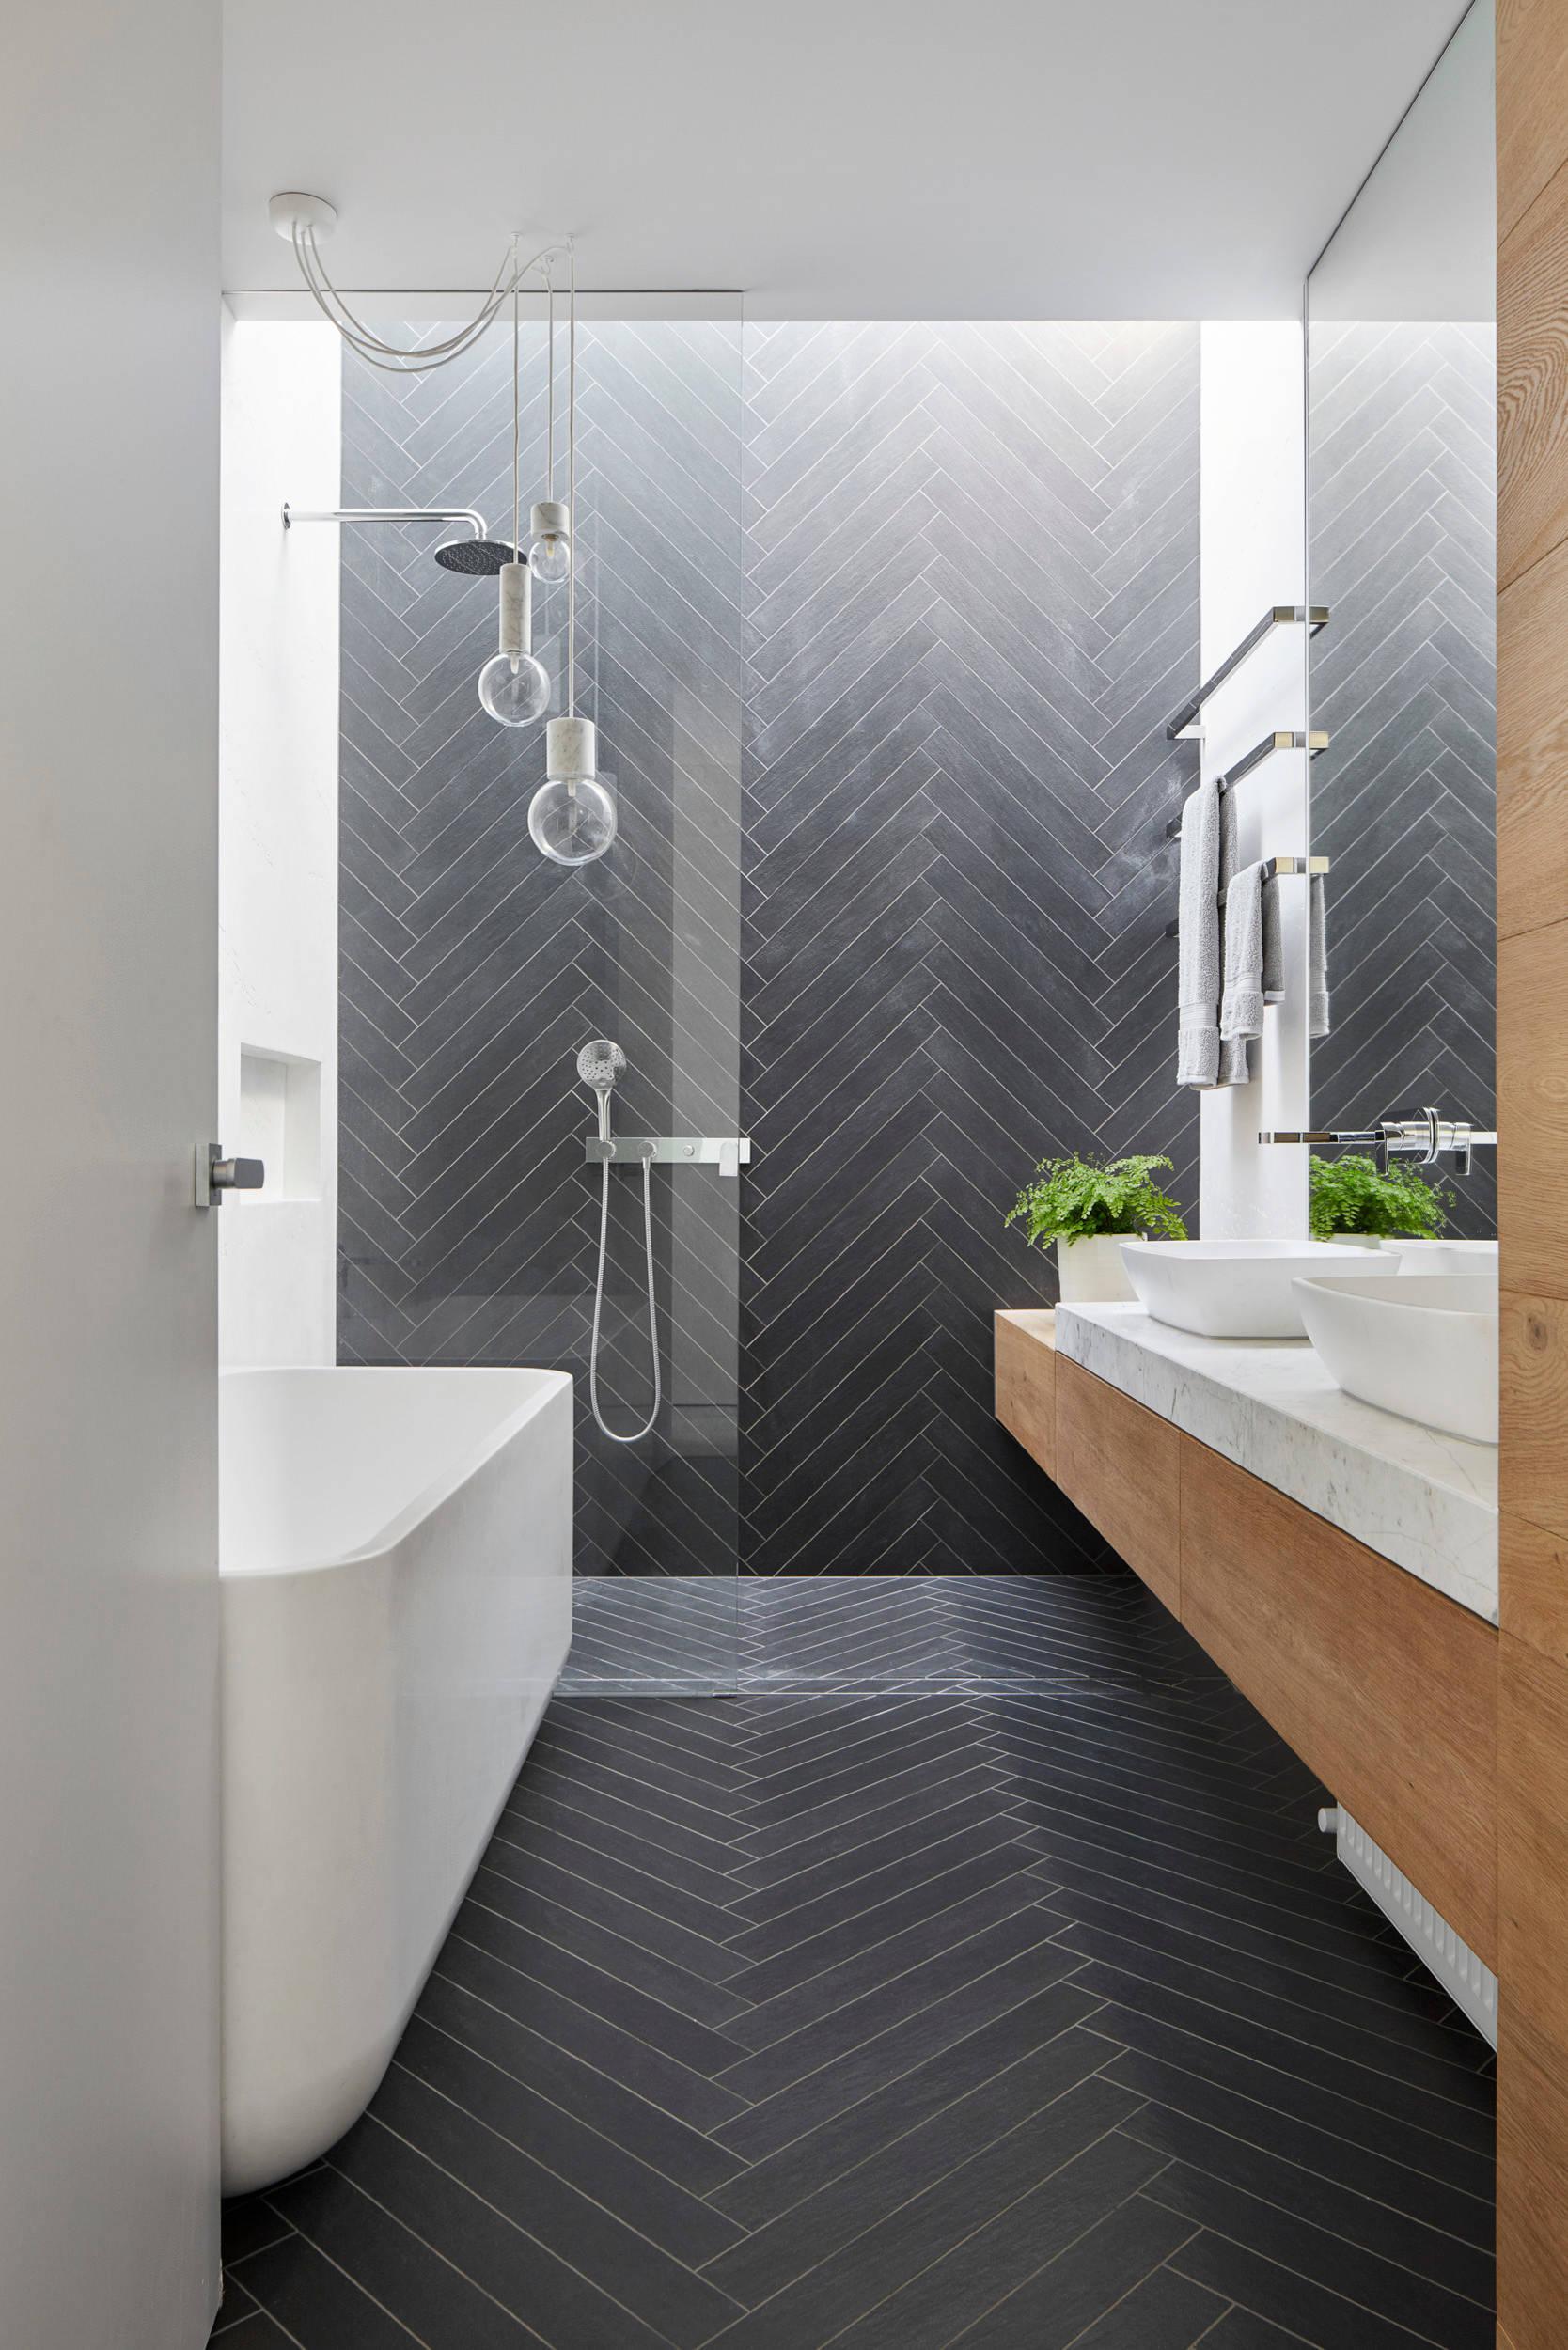 75 Beautiful Black Tile Bathroom Pictures Ideas February 2021 Houzz